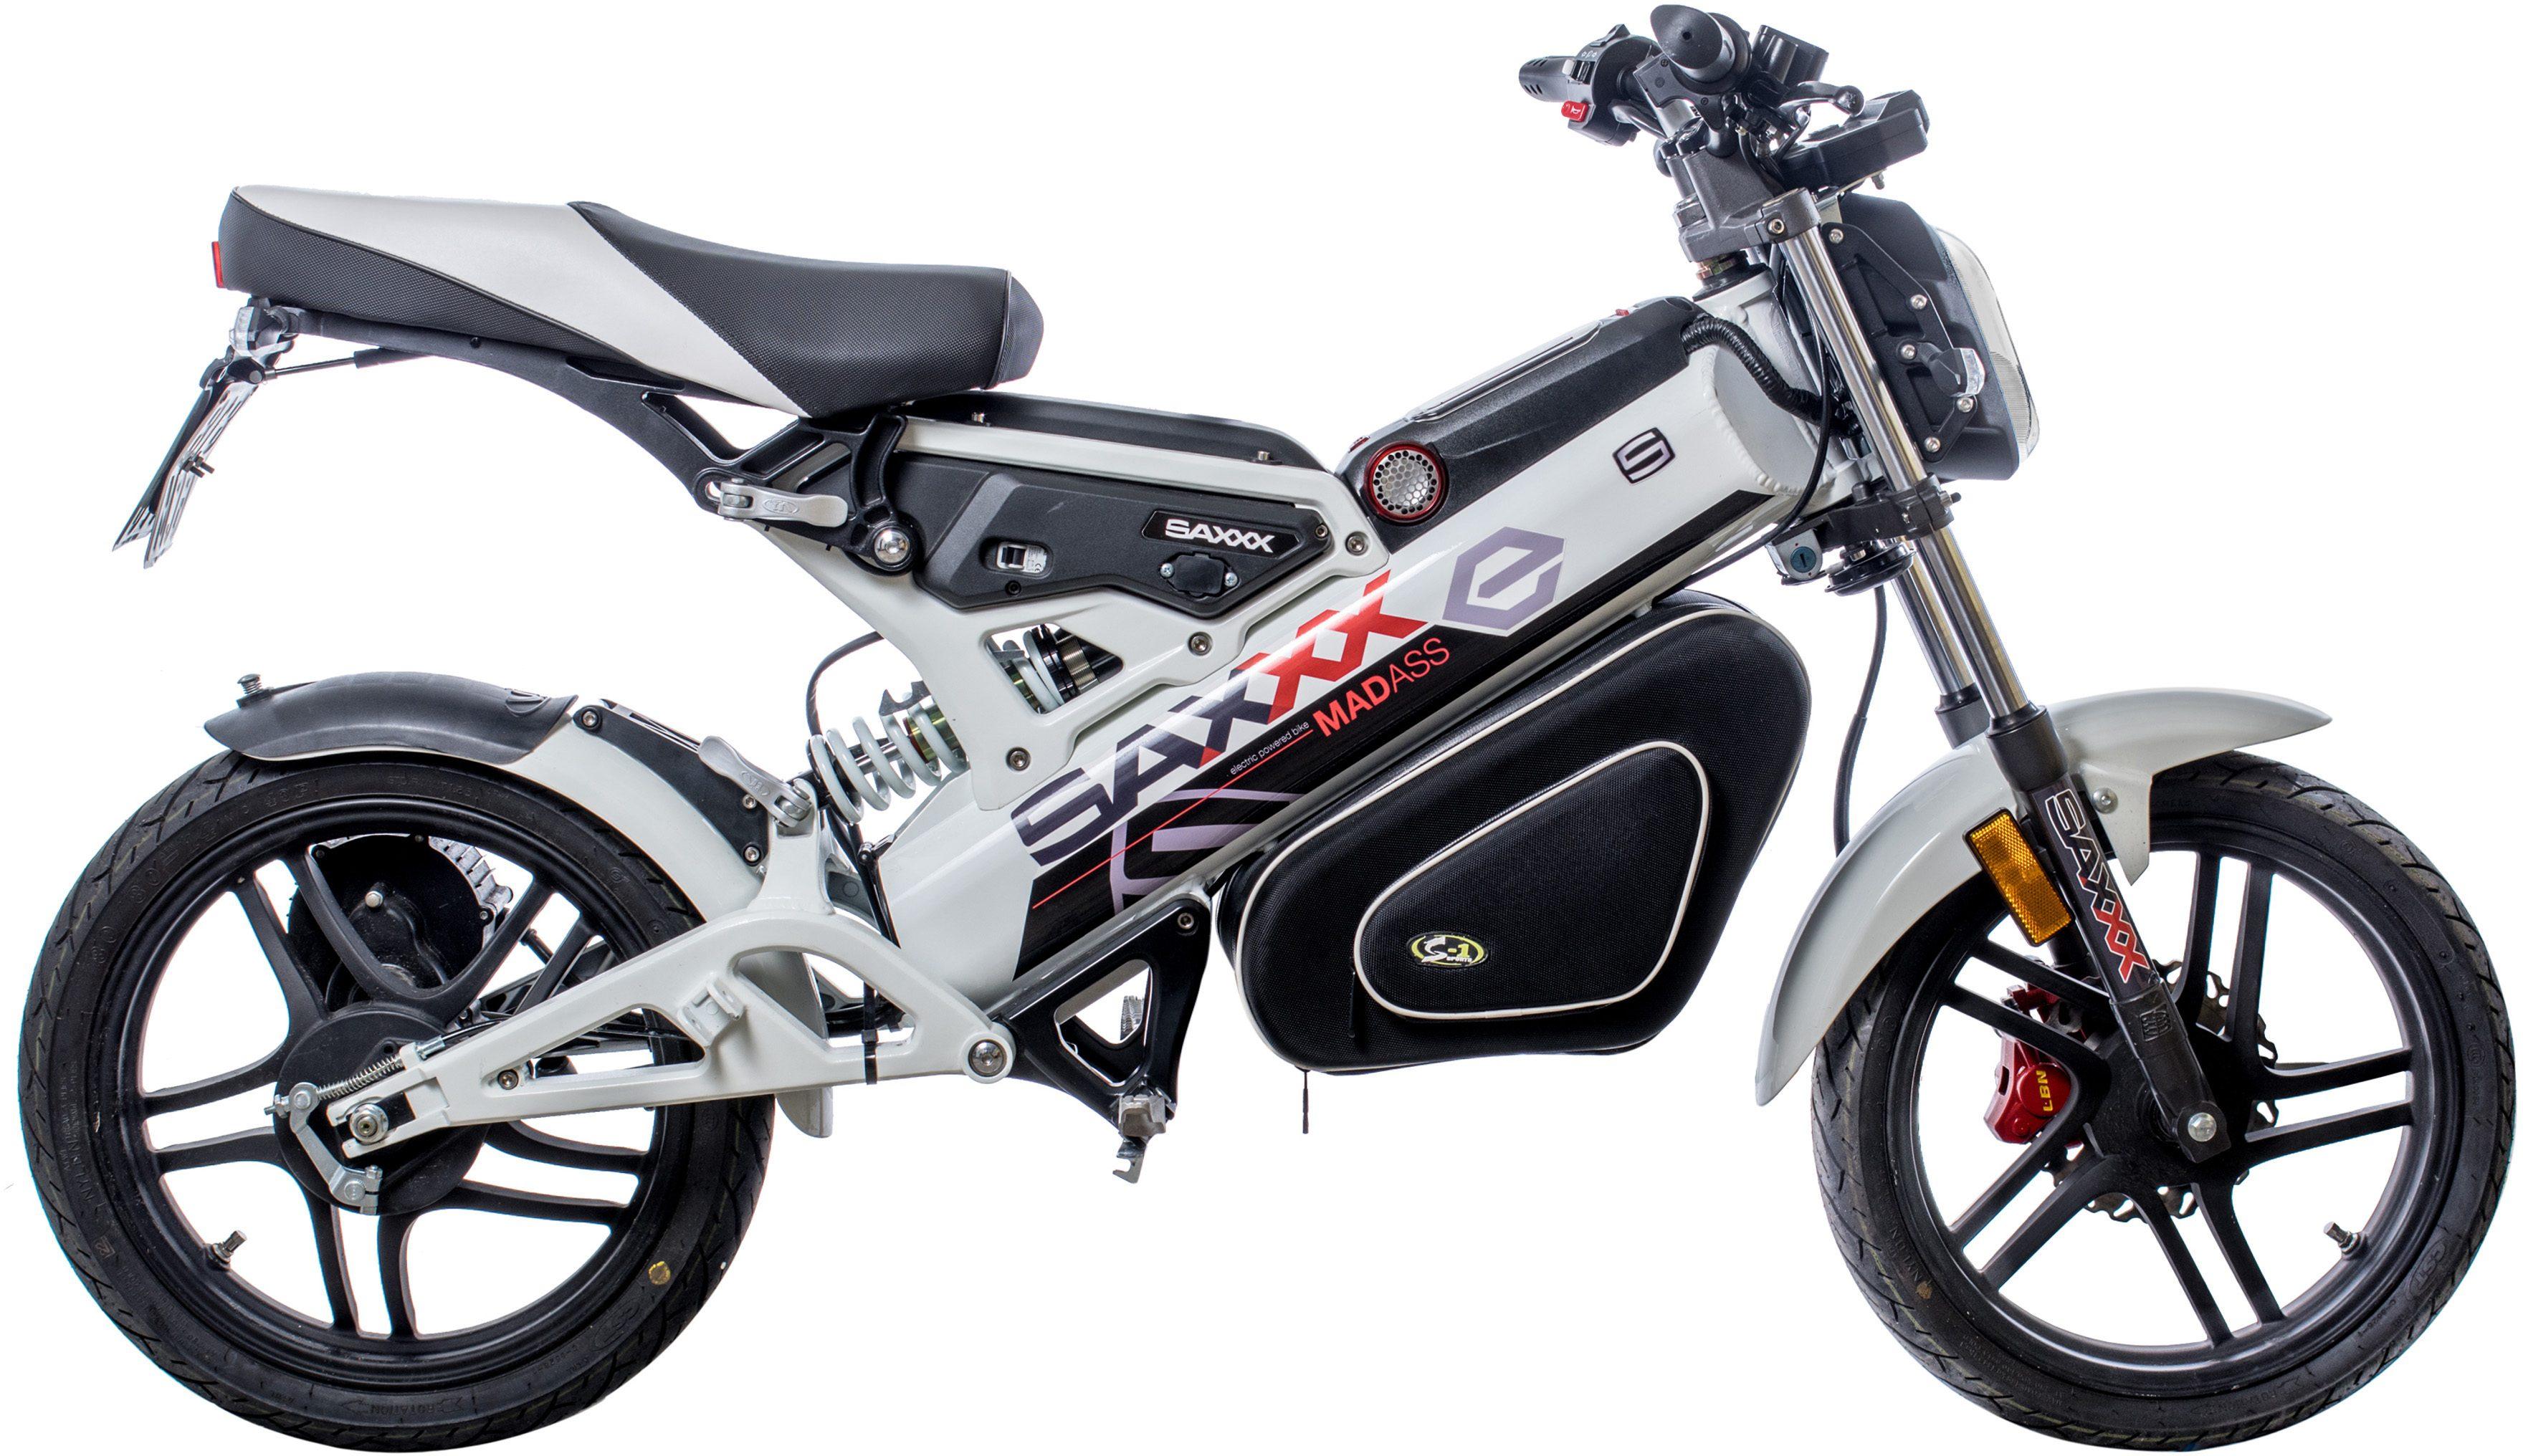 SAXXX Elektro-Mofa, 48V 20AH Lithium Akku, 1500W Motor, »MadAss E 25 Km/h«